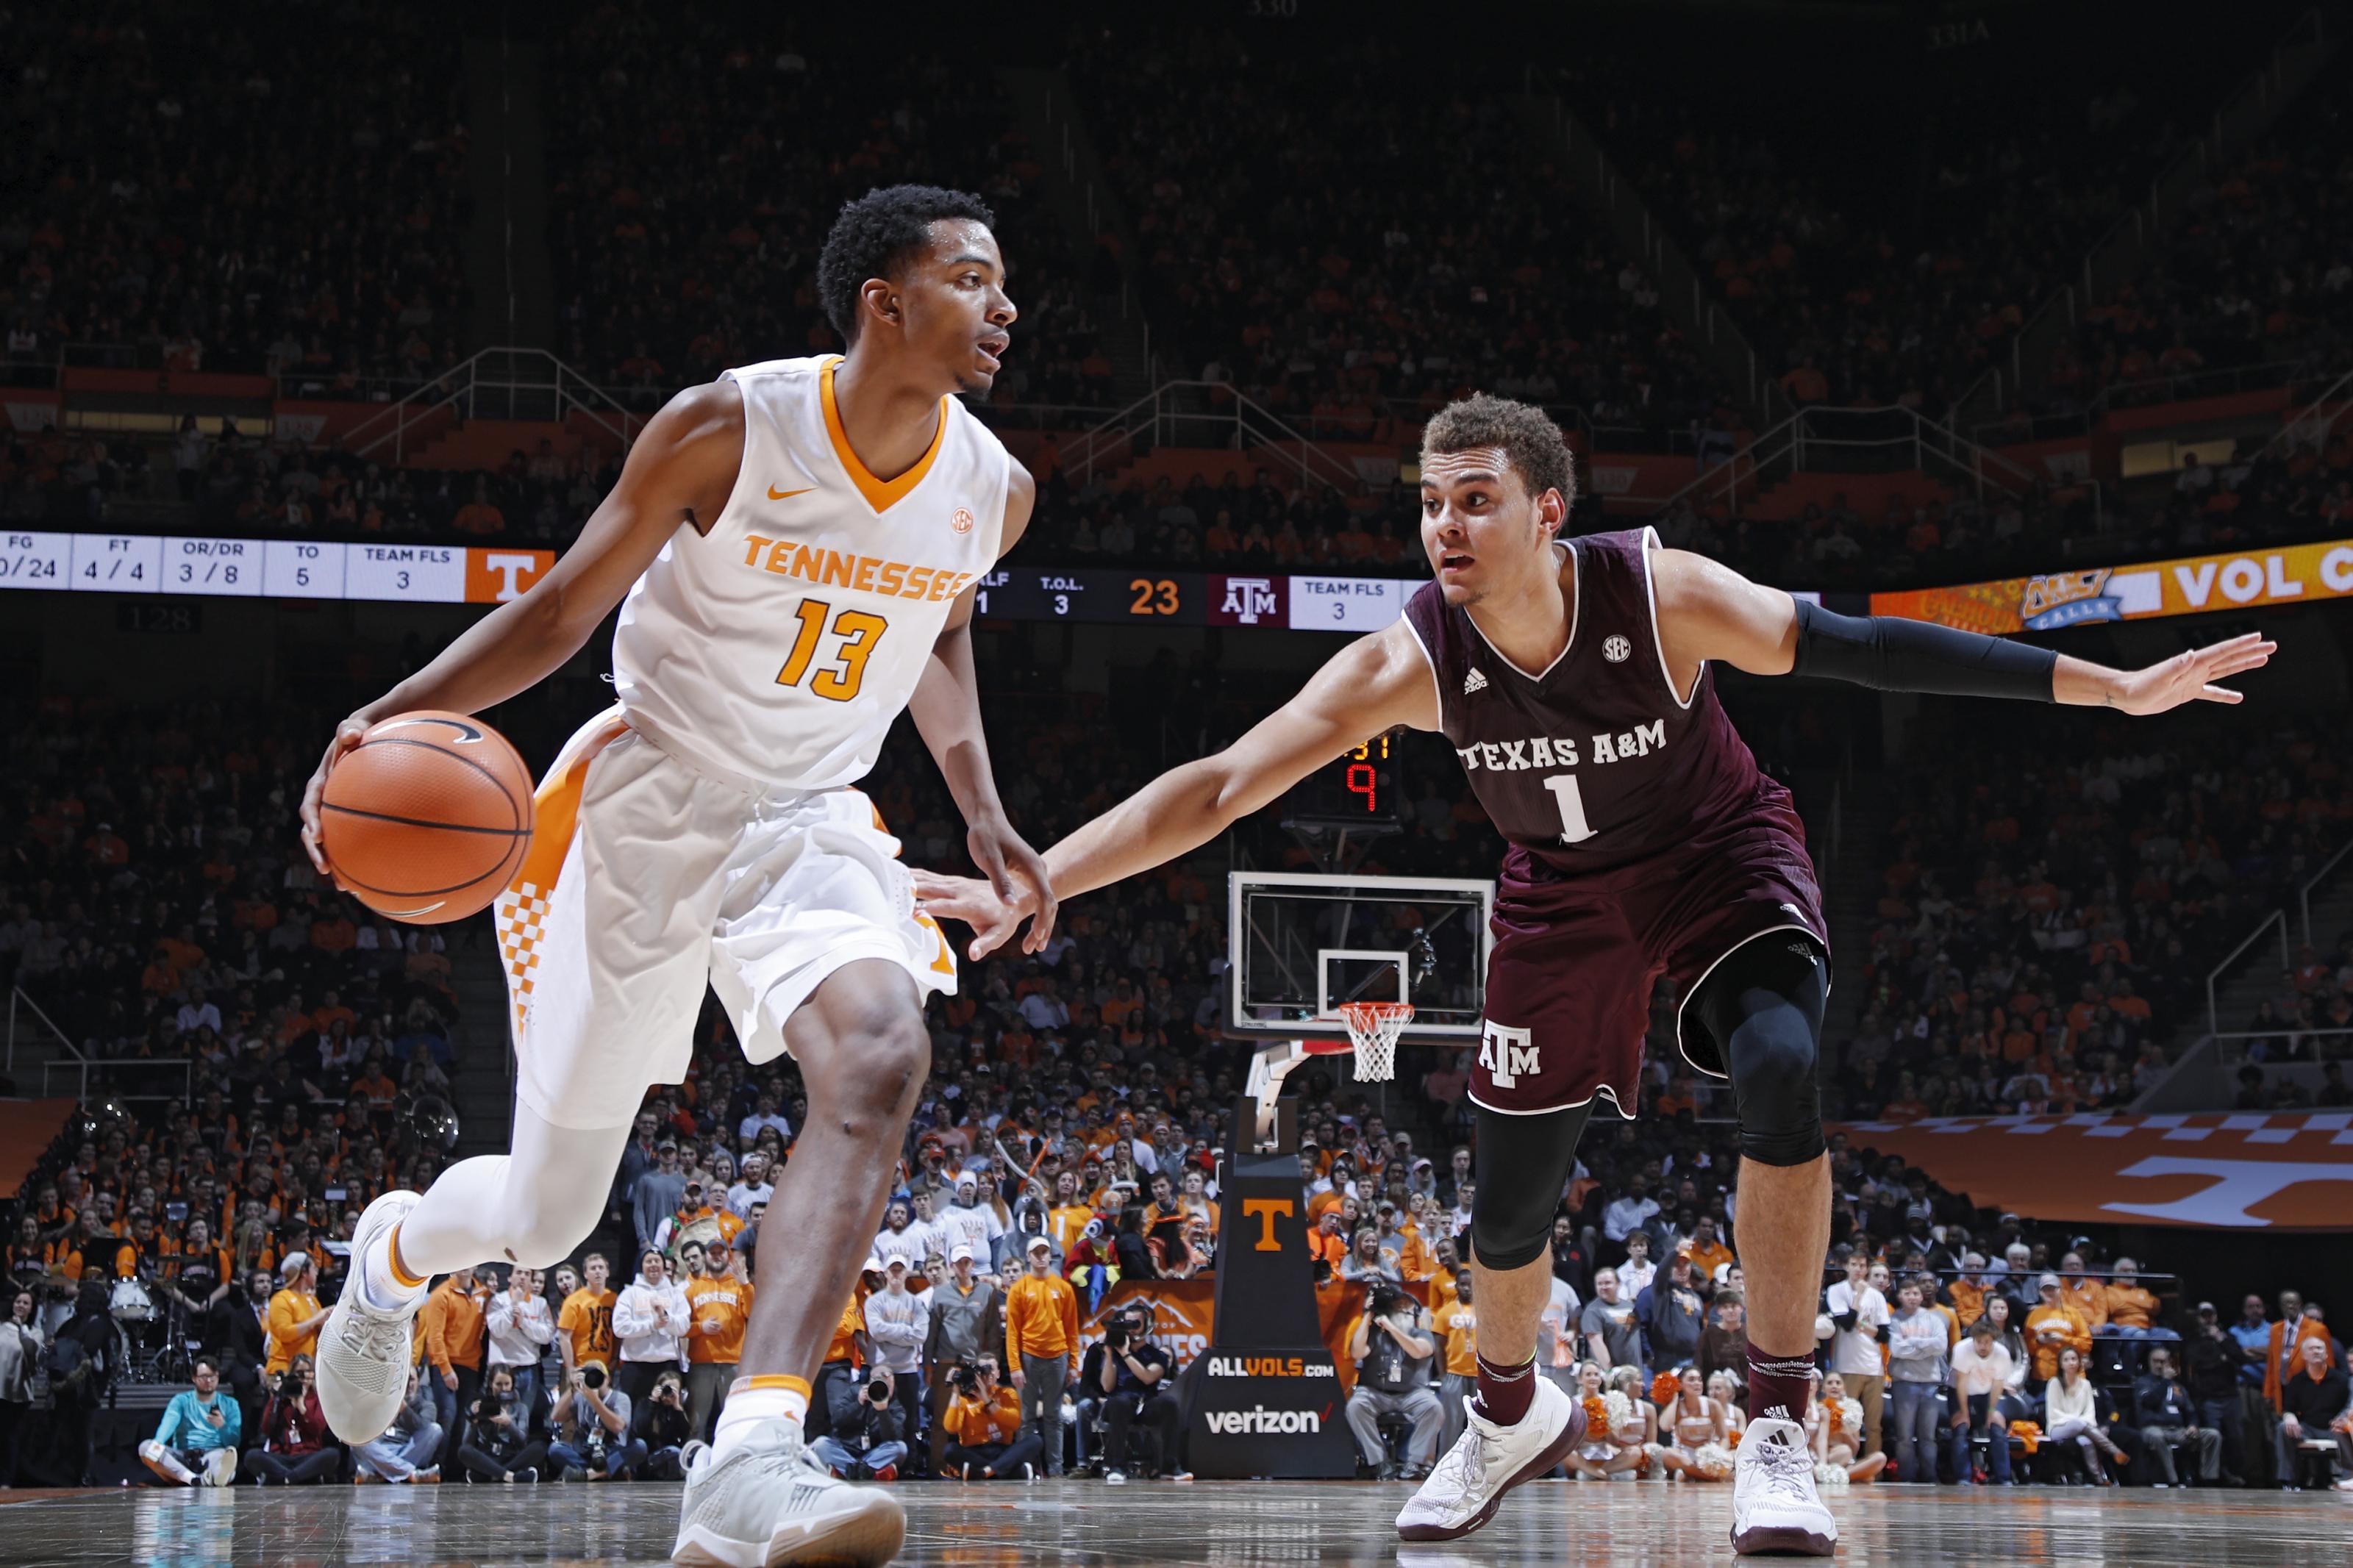 Tennessee basketball: Vols G Jalen Johnson enters transfer portal